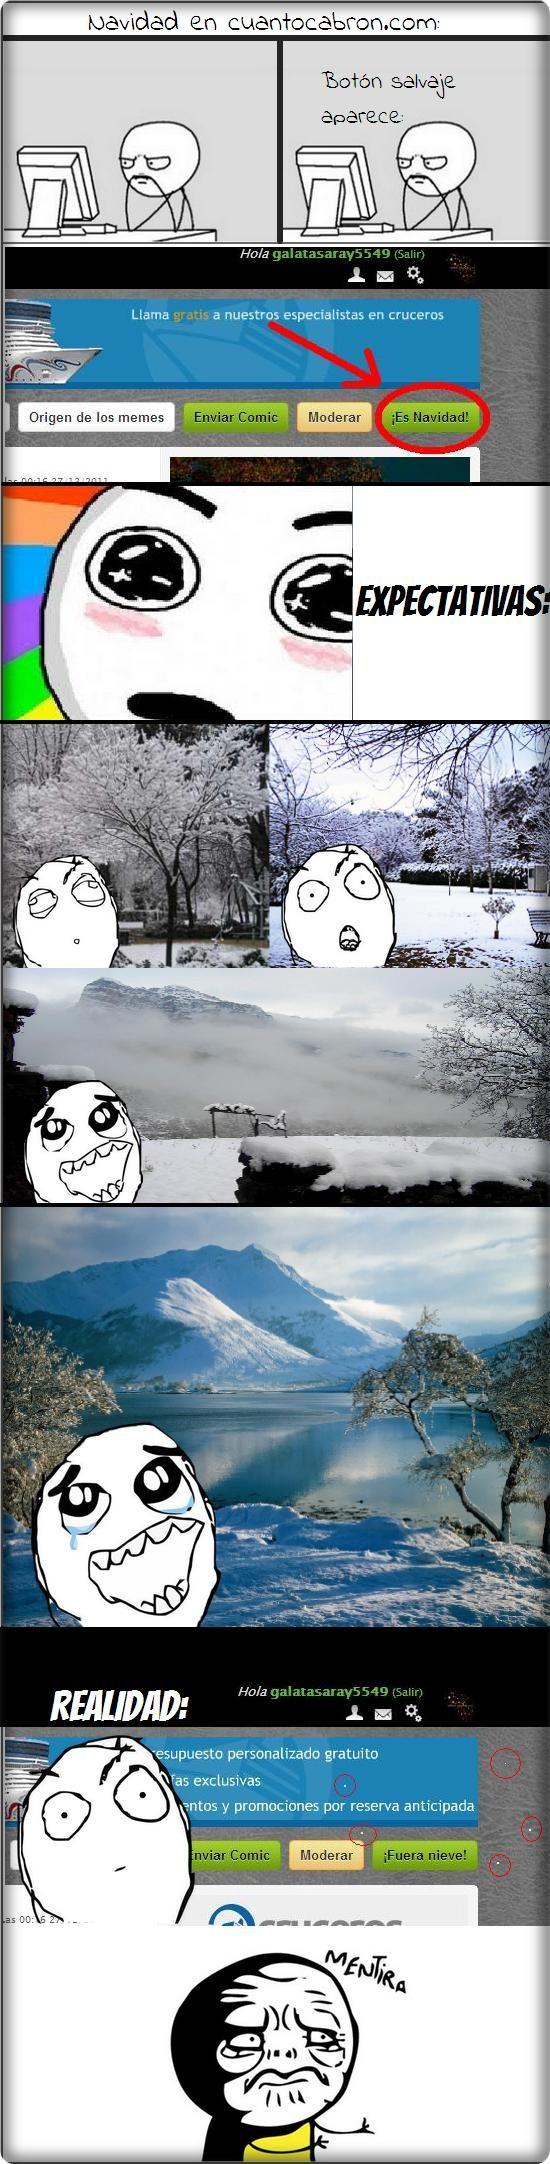 boton,fuera,mentira,navidad,nieve